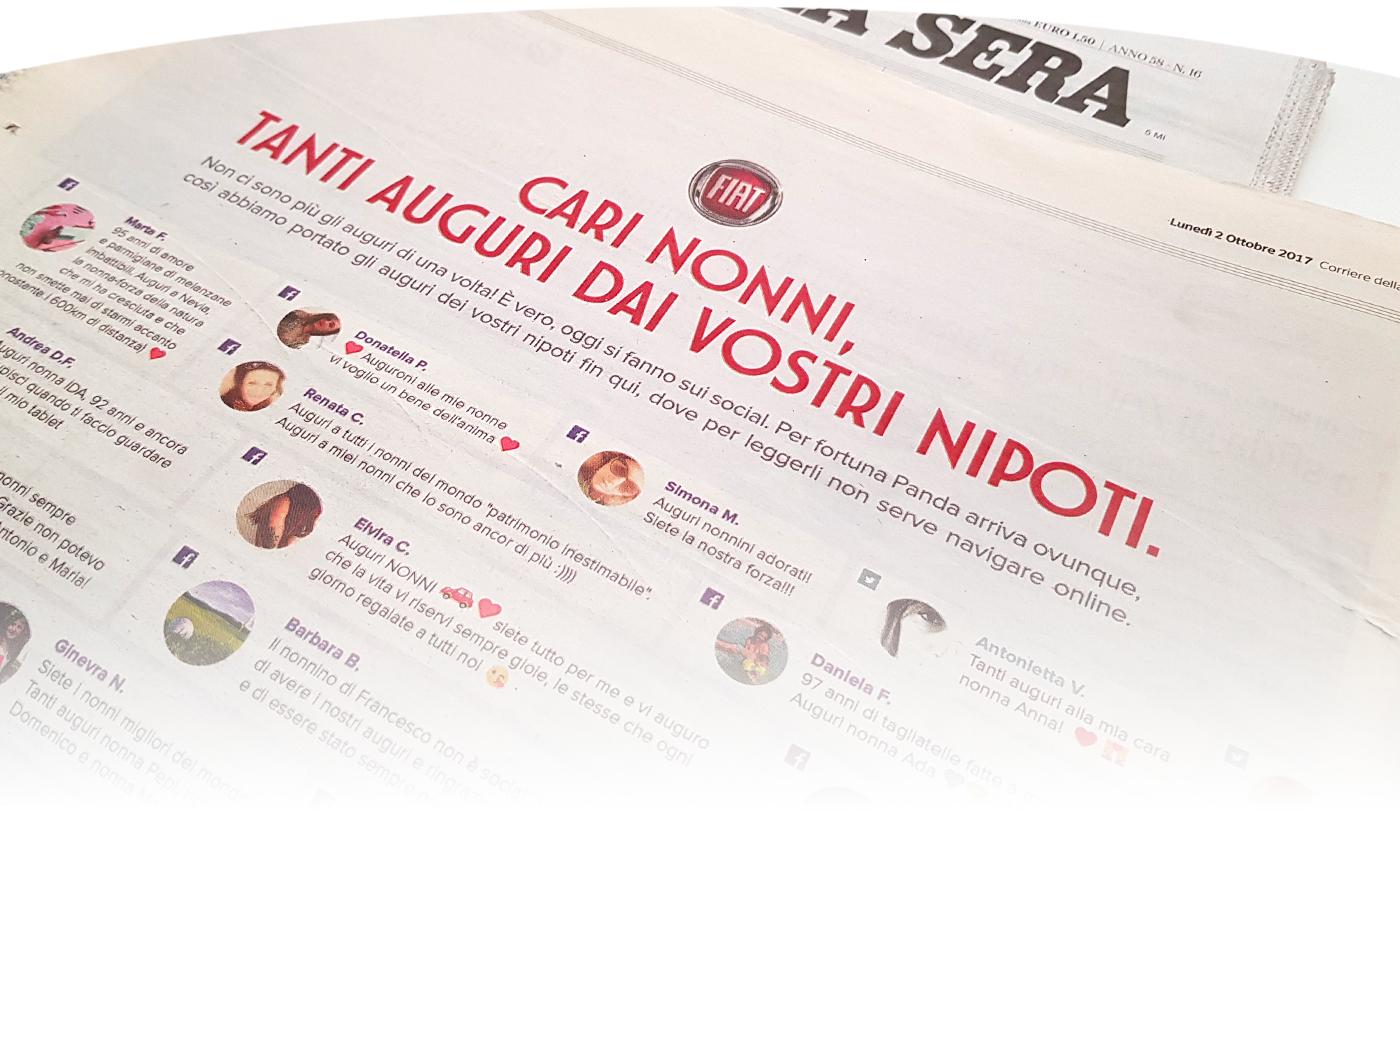 fiat car grandparents wish Panda  social best wishes newspaper print surprise